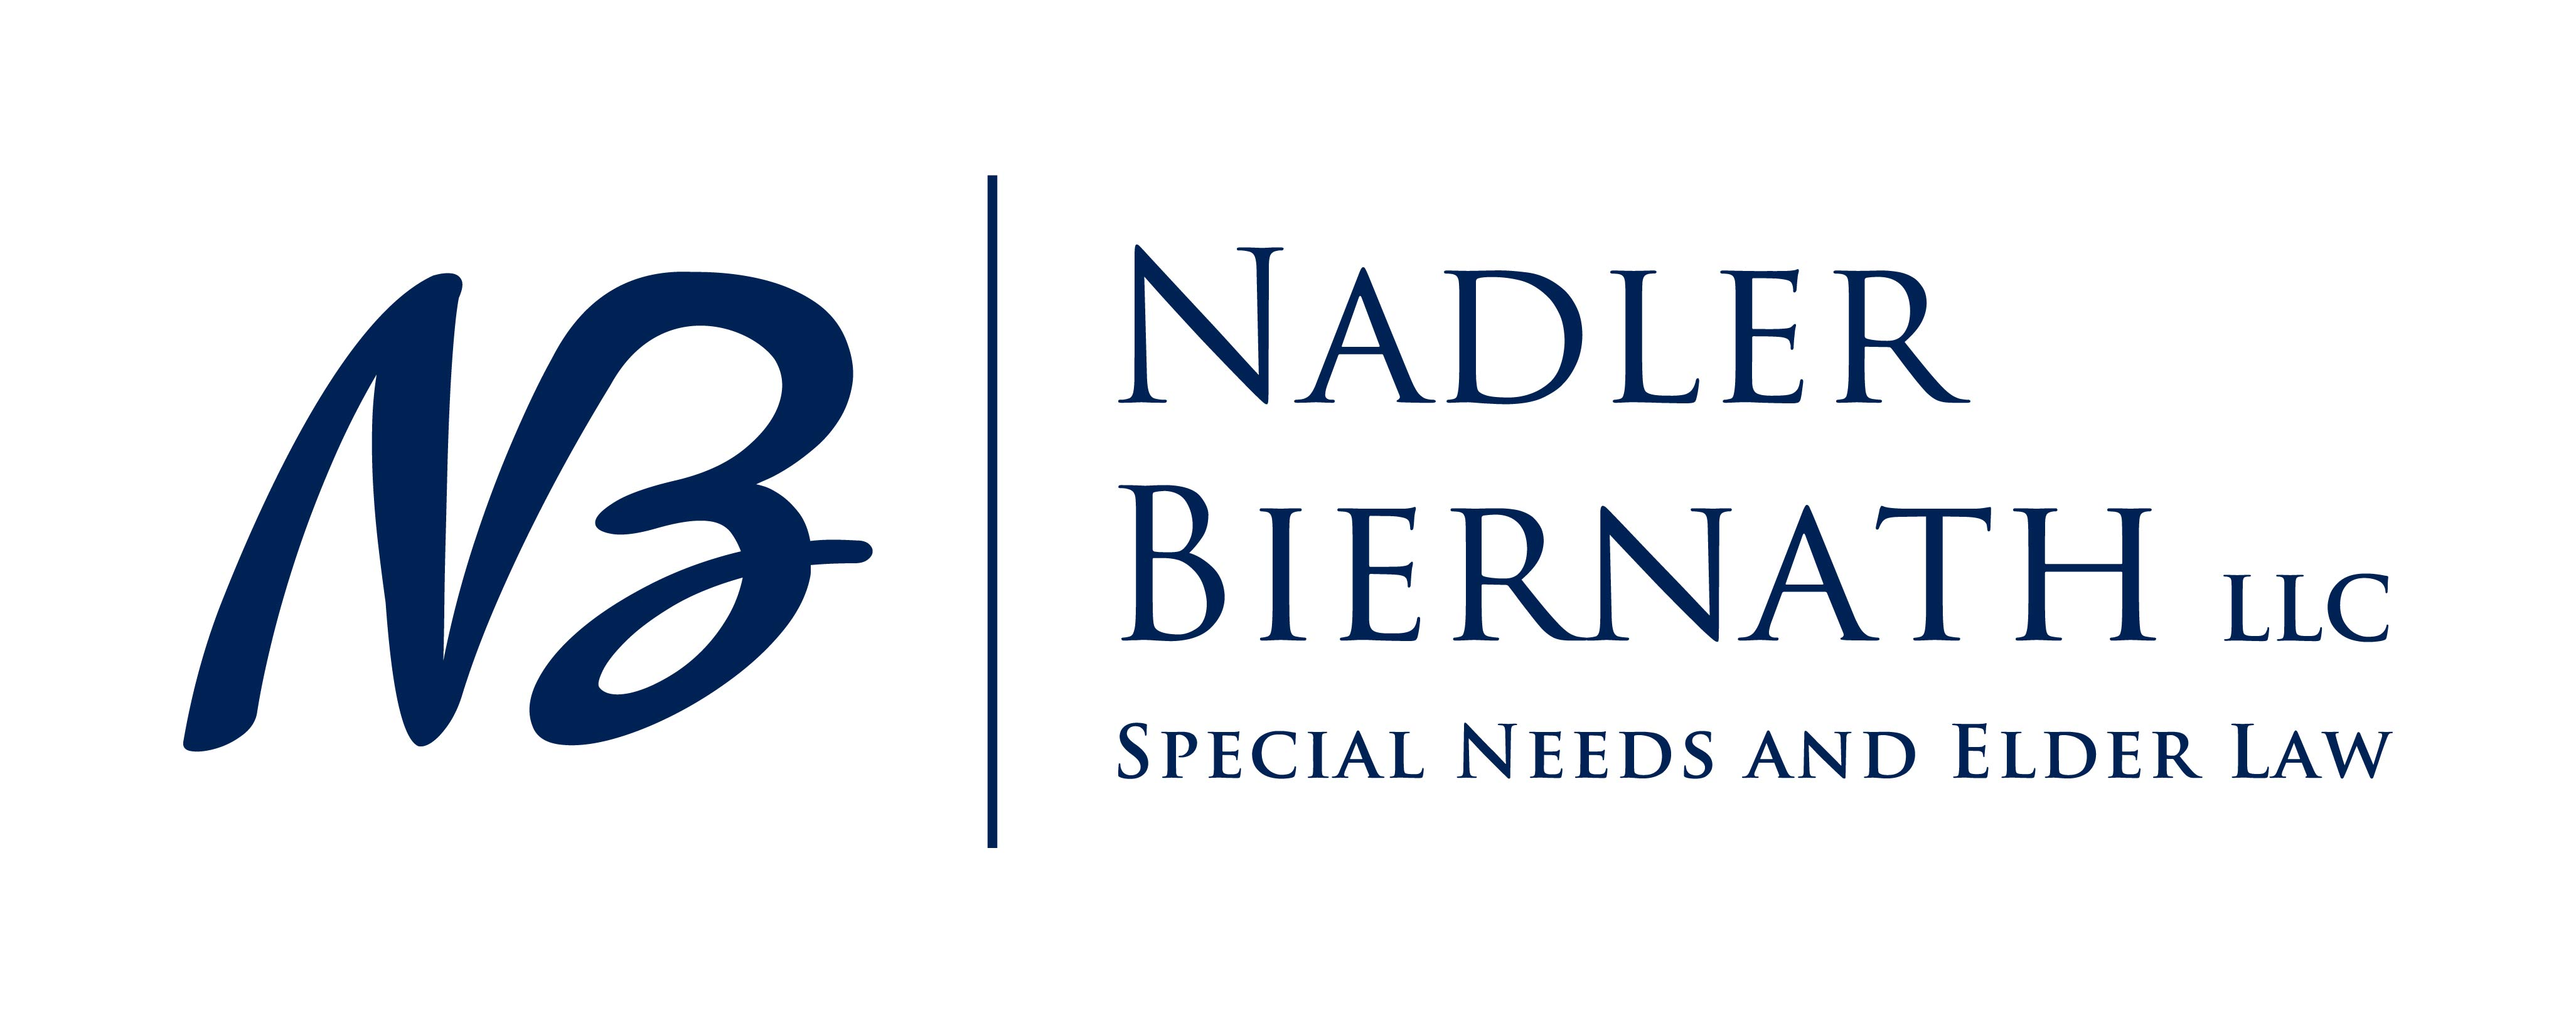 Nadler Biernath Logo